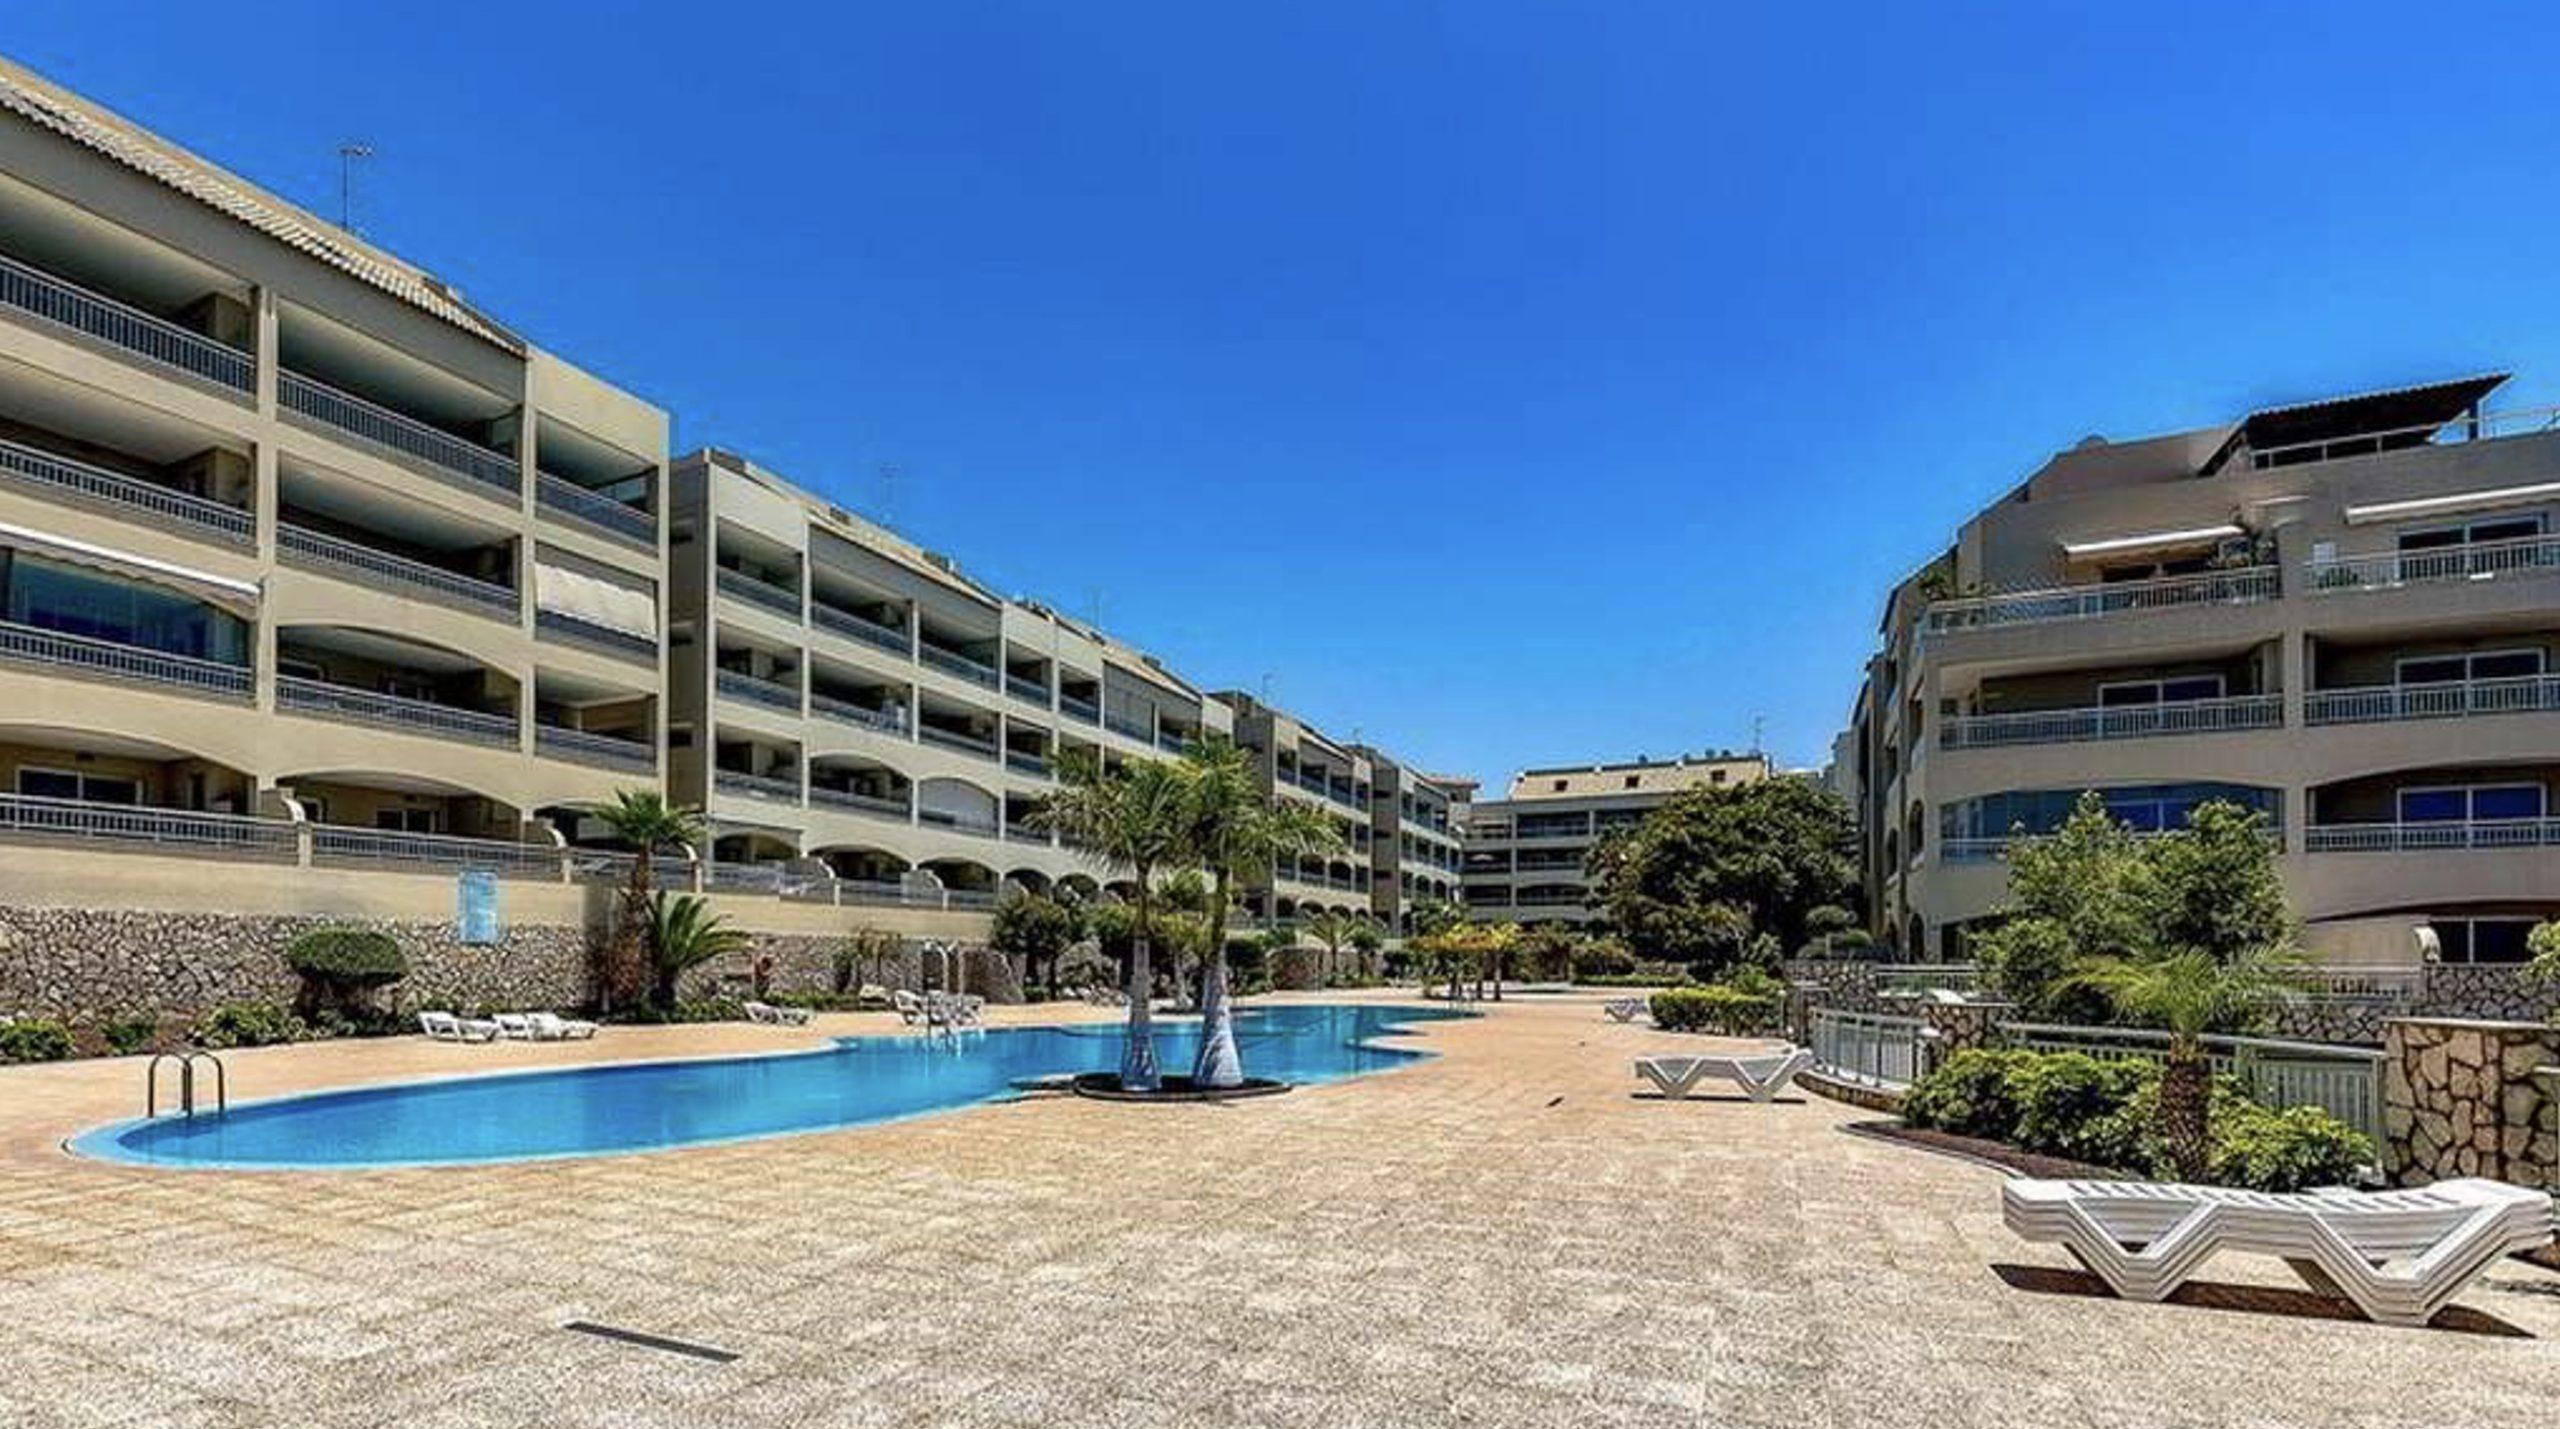 San Remo – Palm Mar – Ref: 5RB8037